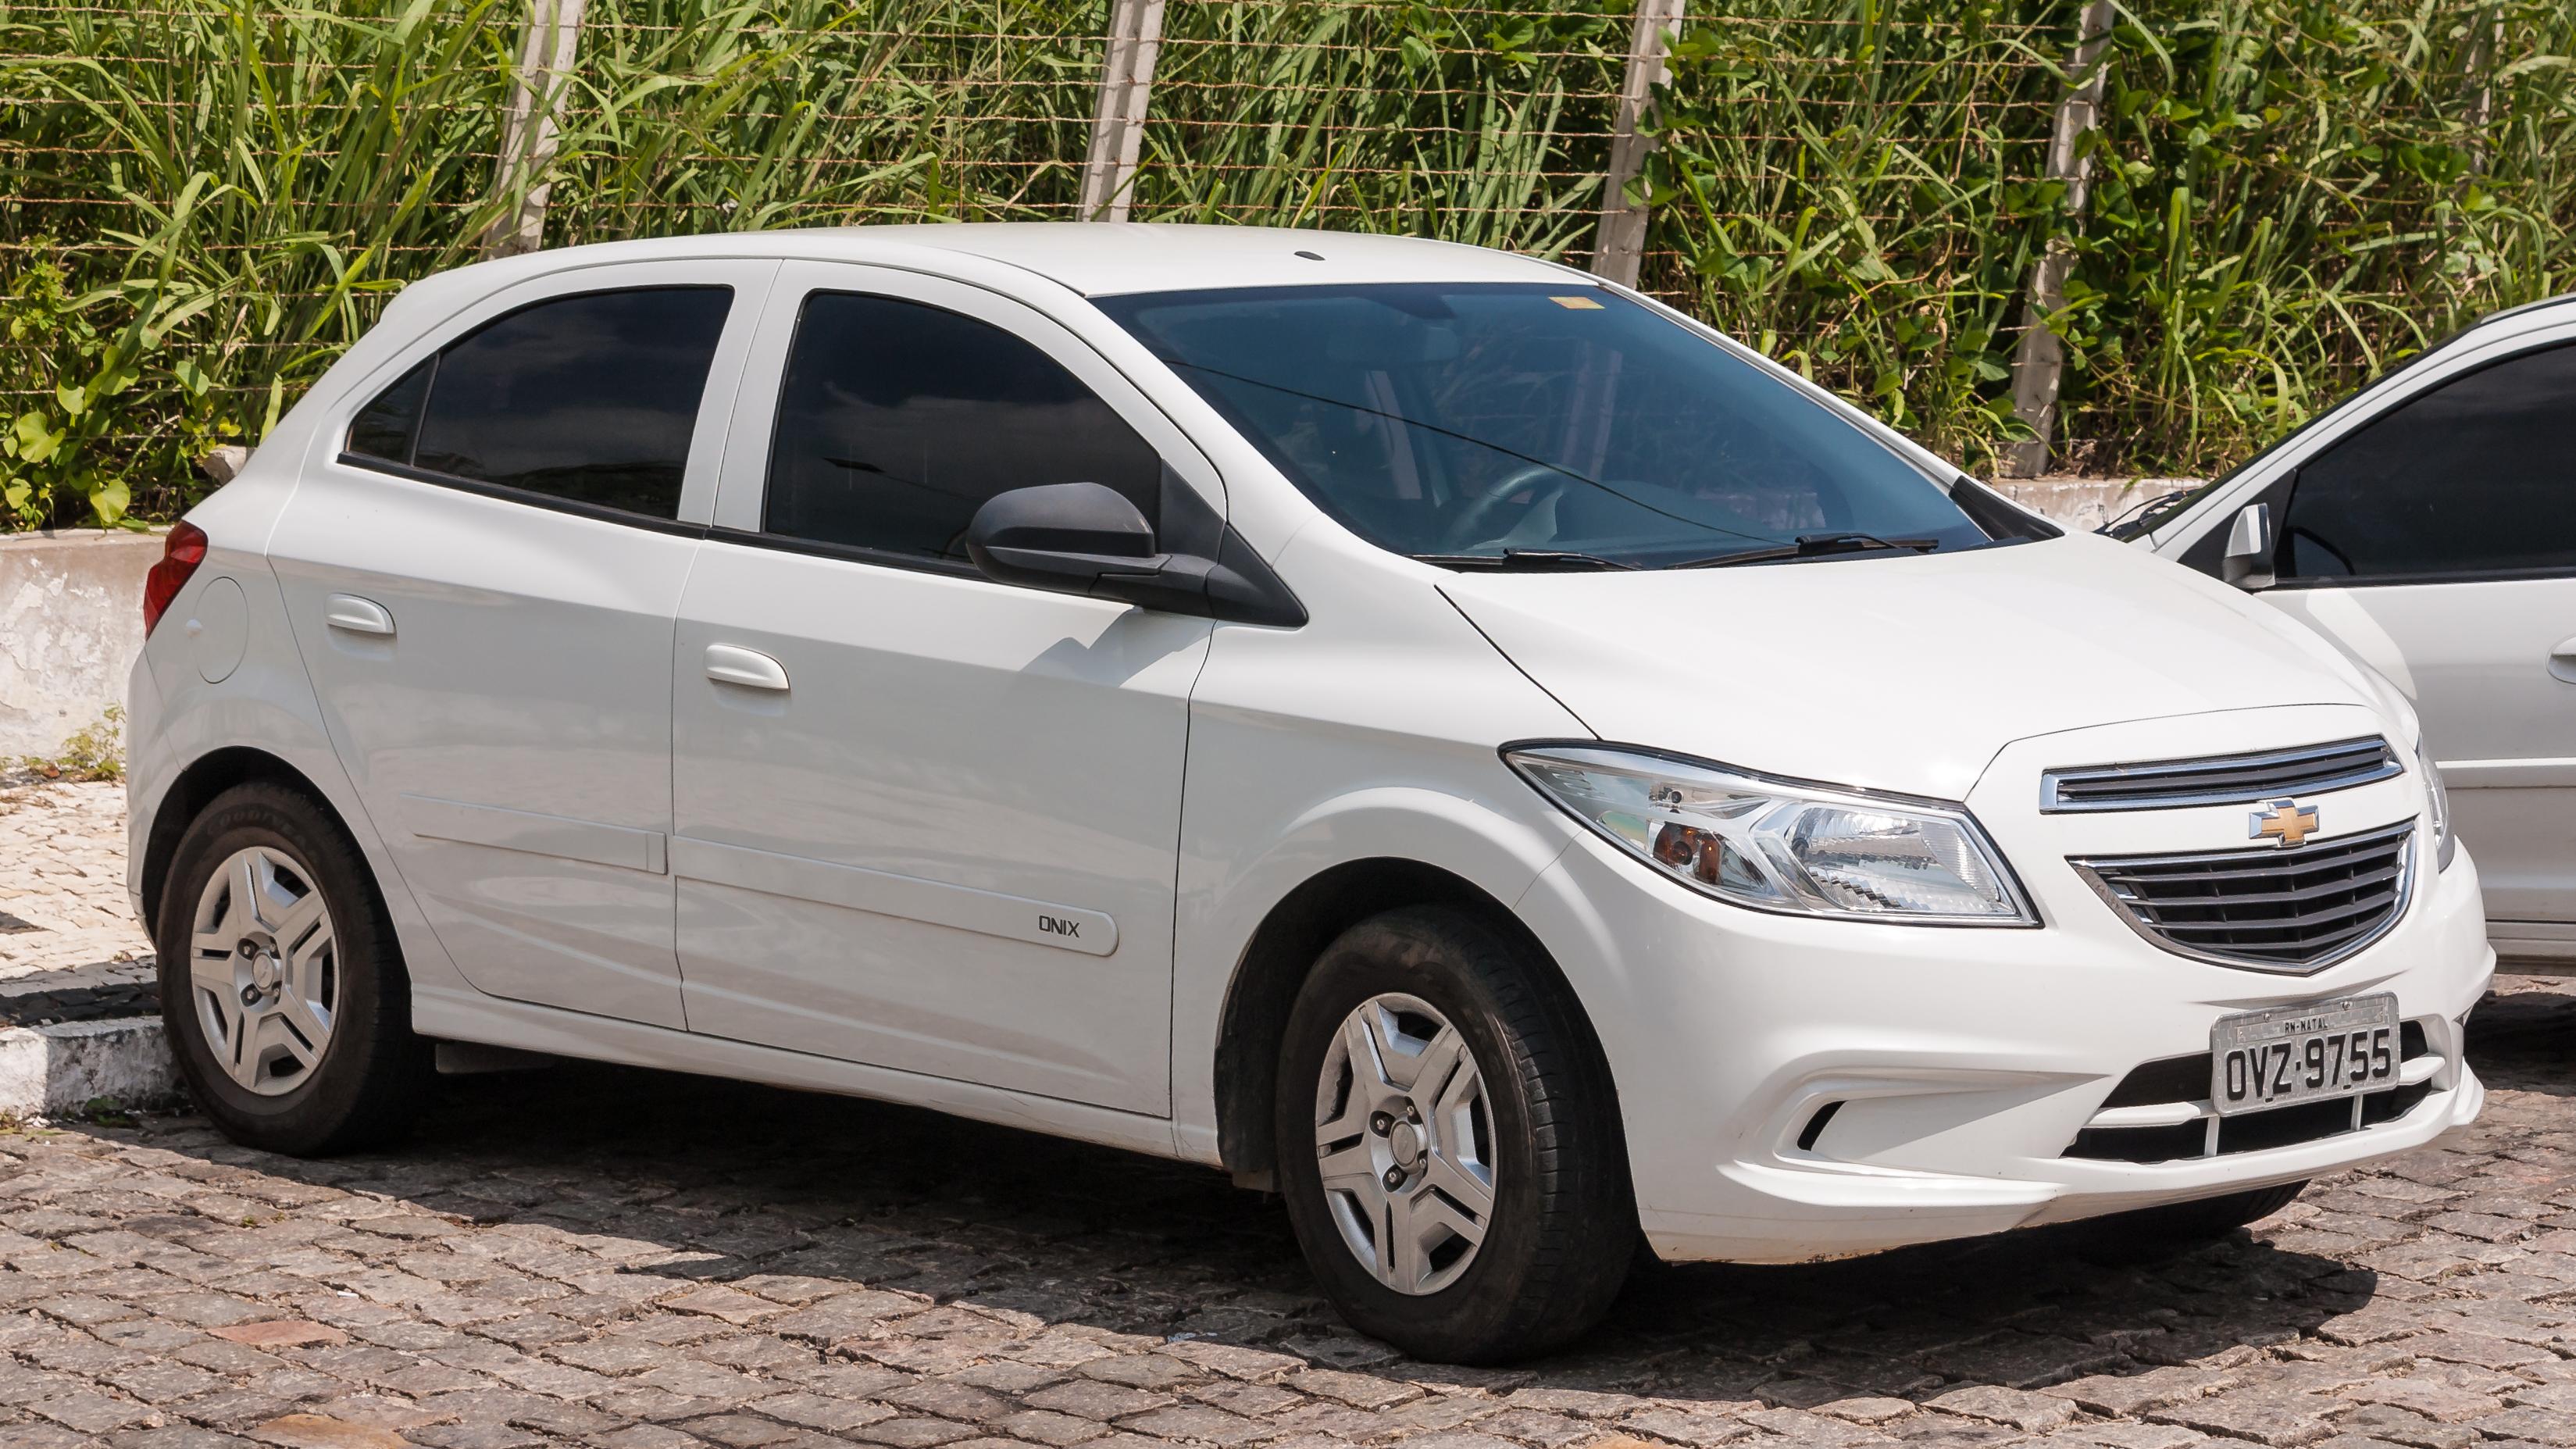 Chevrolet Onix Wikipedia